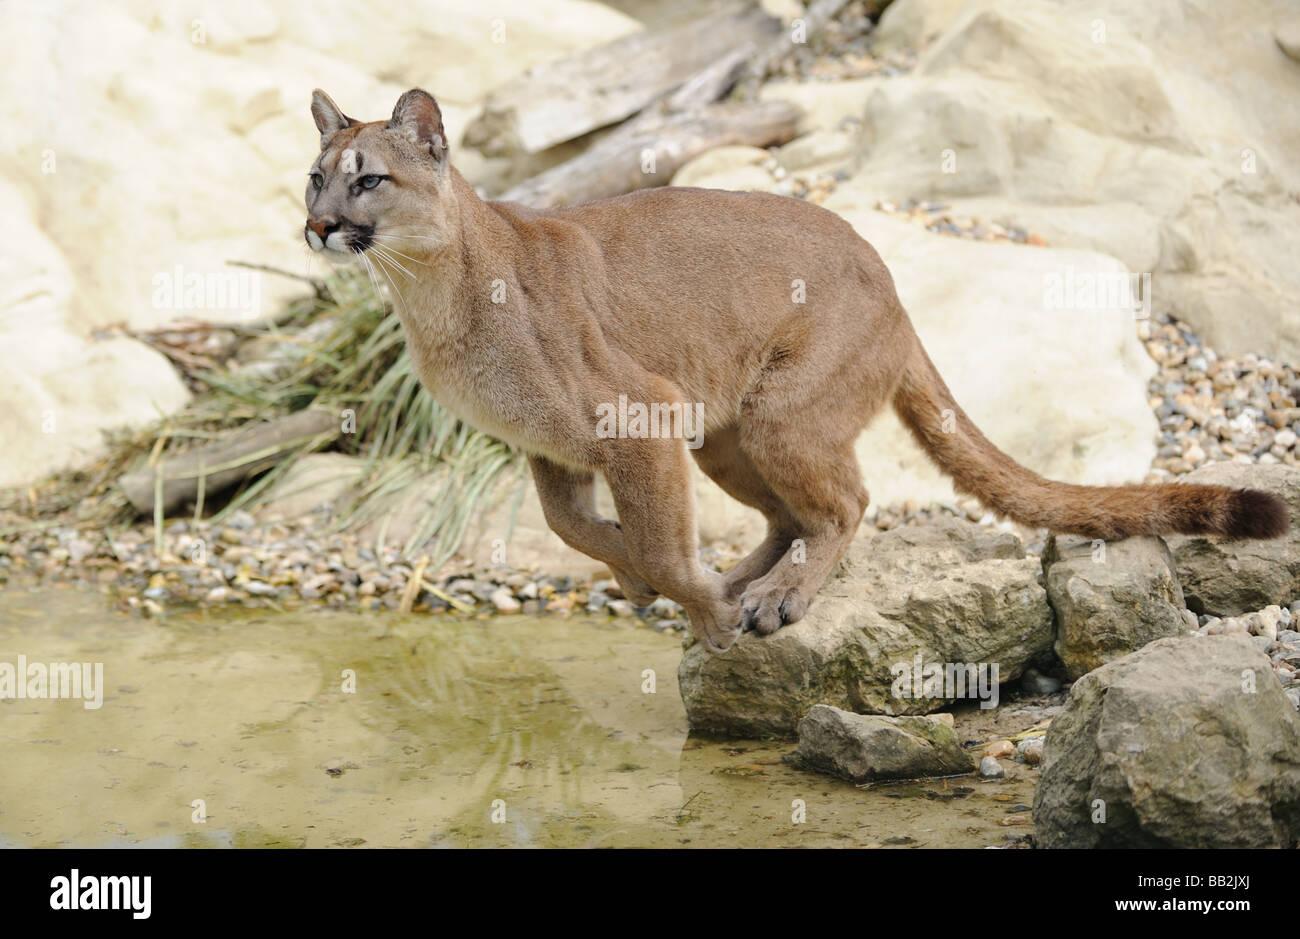 Puma Jumping - Stock Image